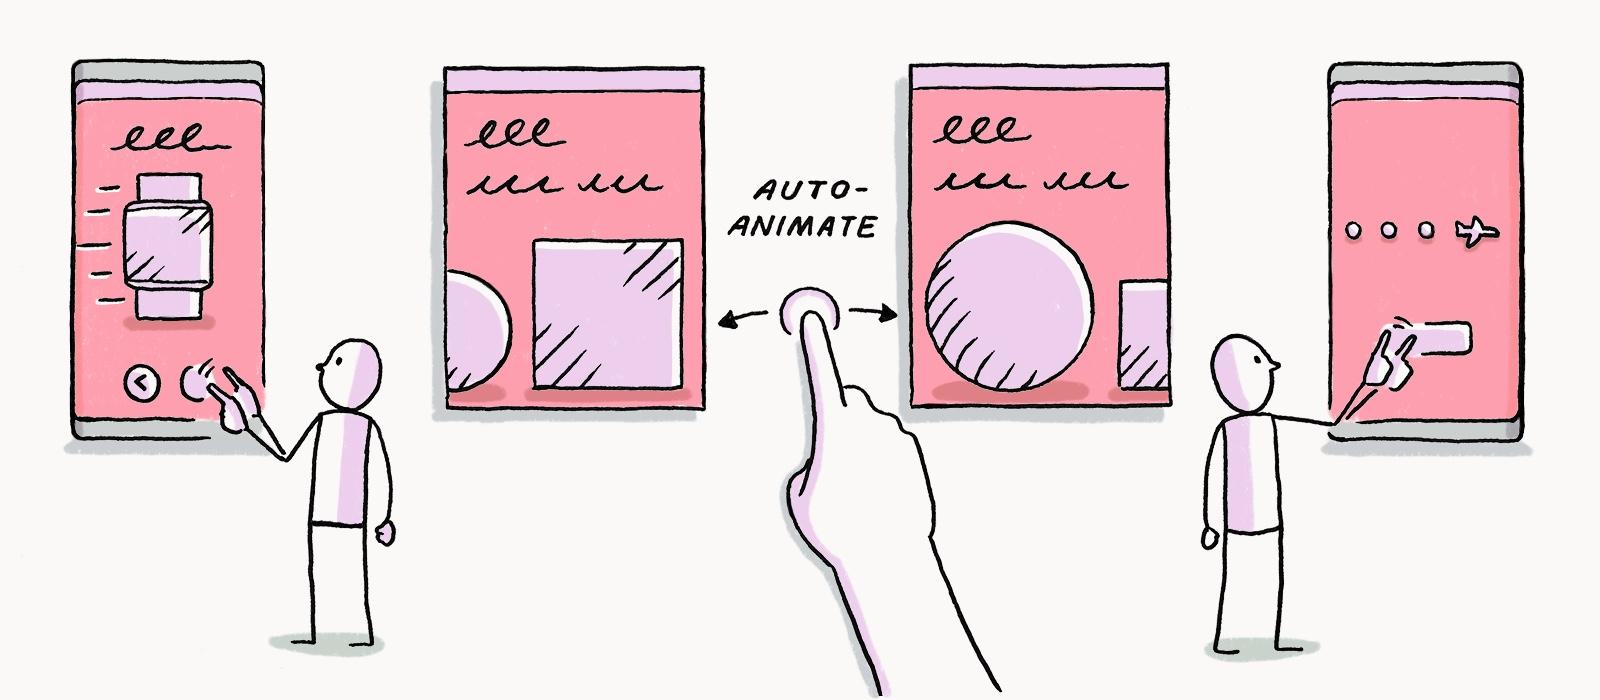 Interactive Prototypes using Auto-Animate by Adobe XD